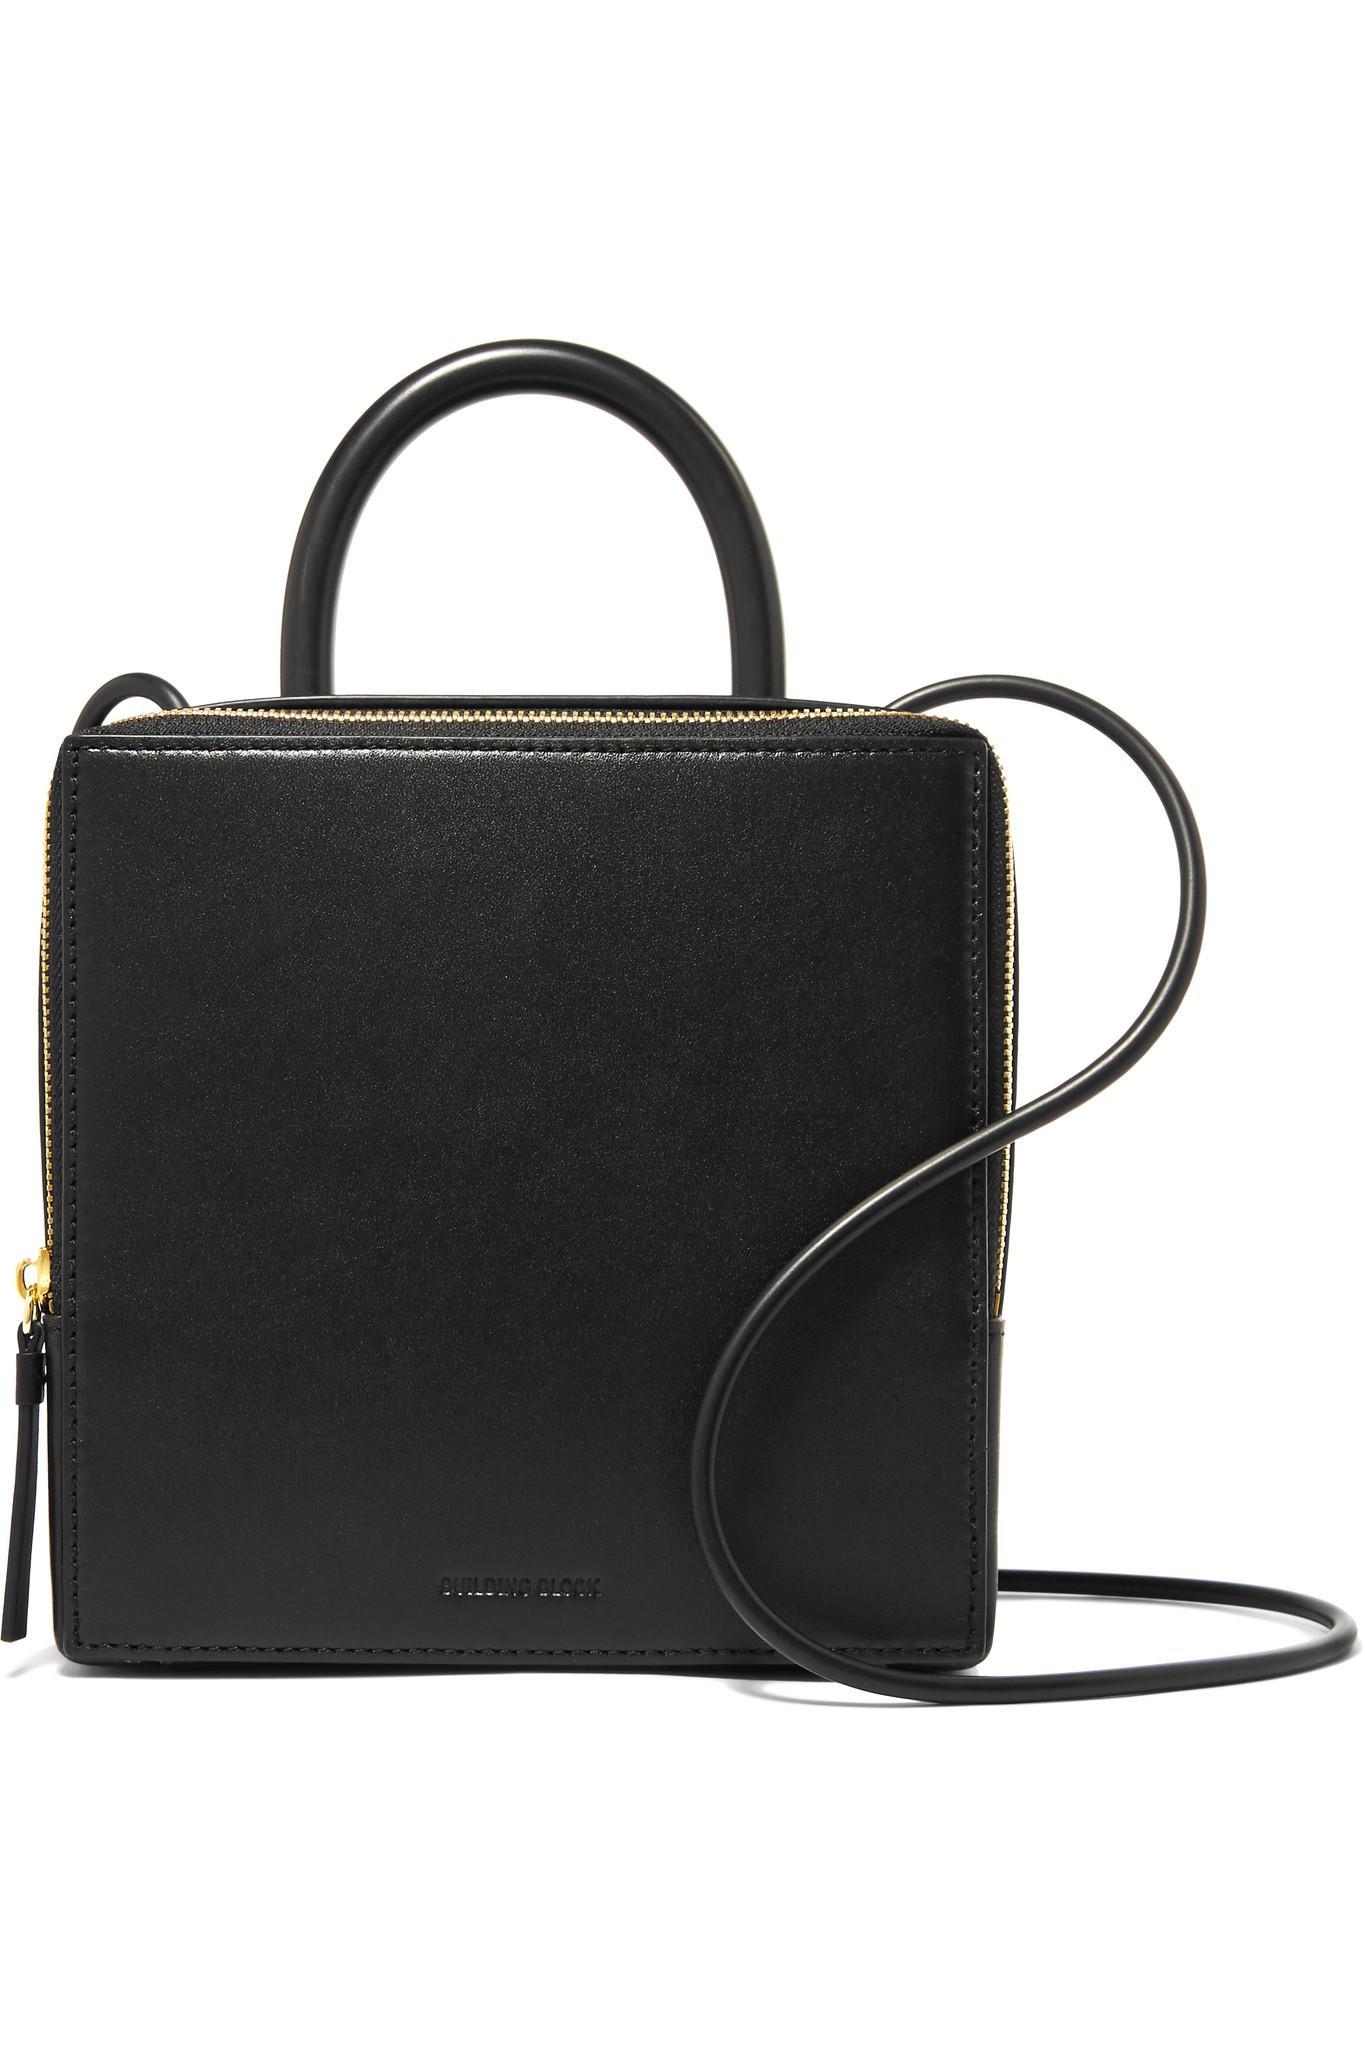 Box Leather Shoulder Bag - Black Building Block wZaQjA